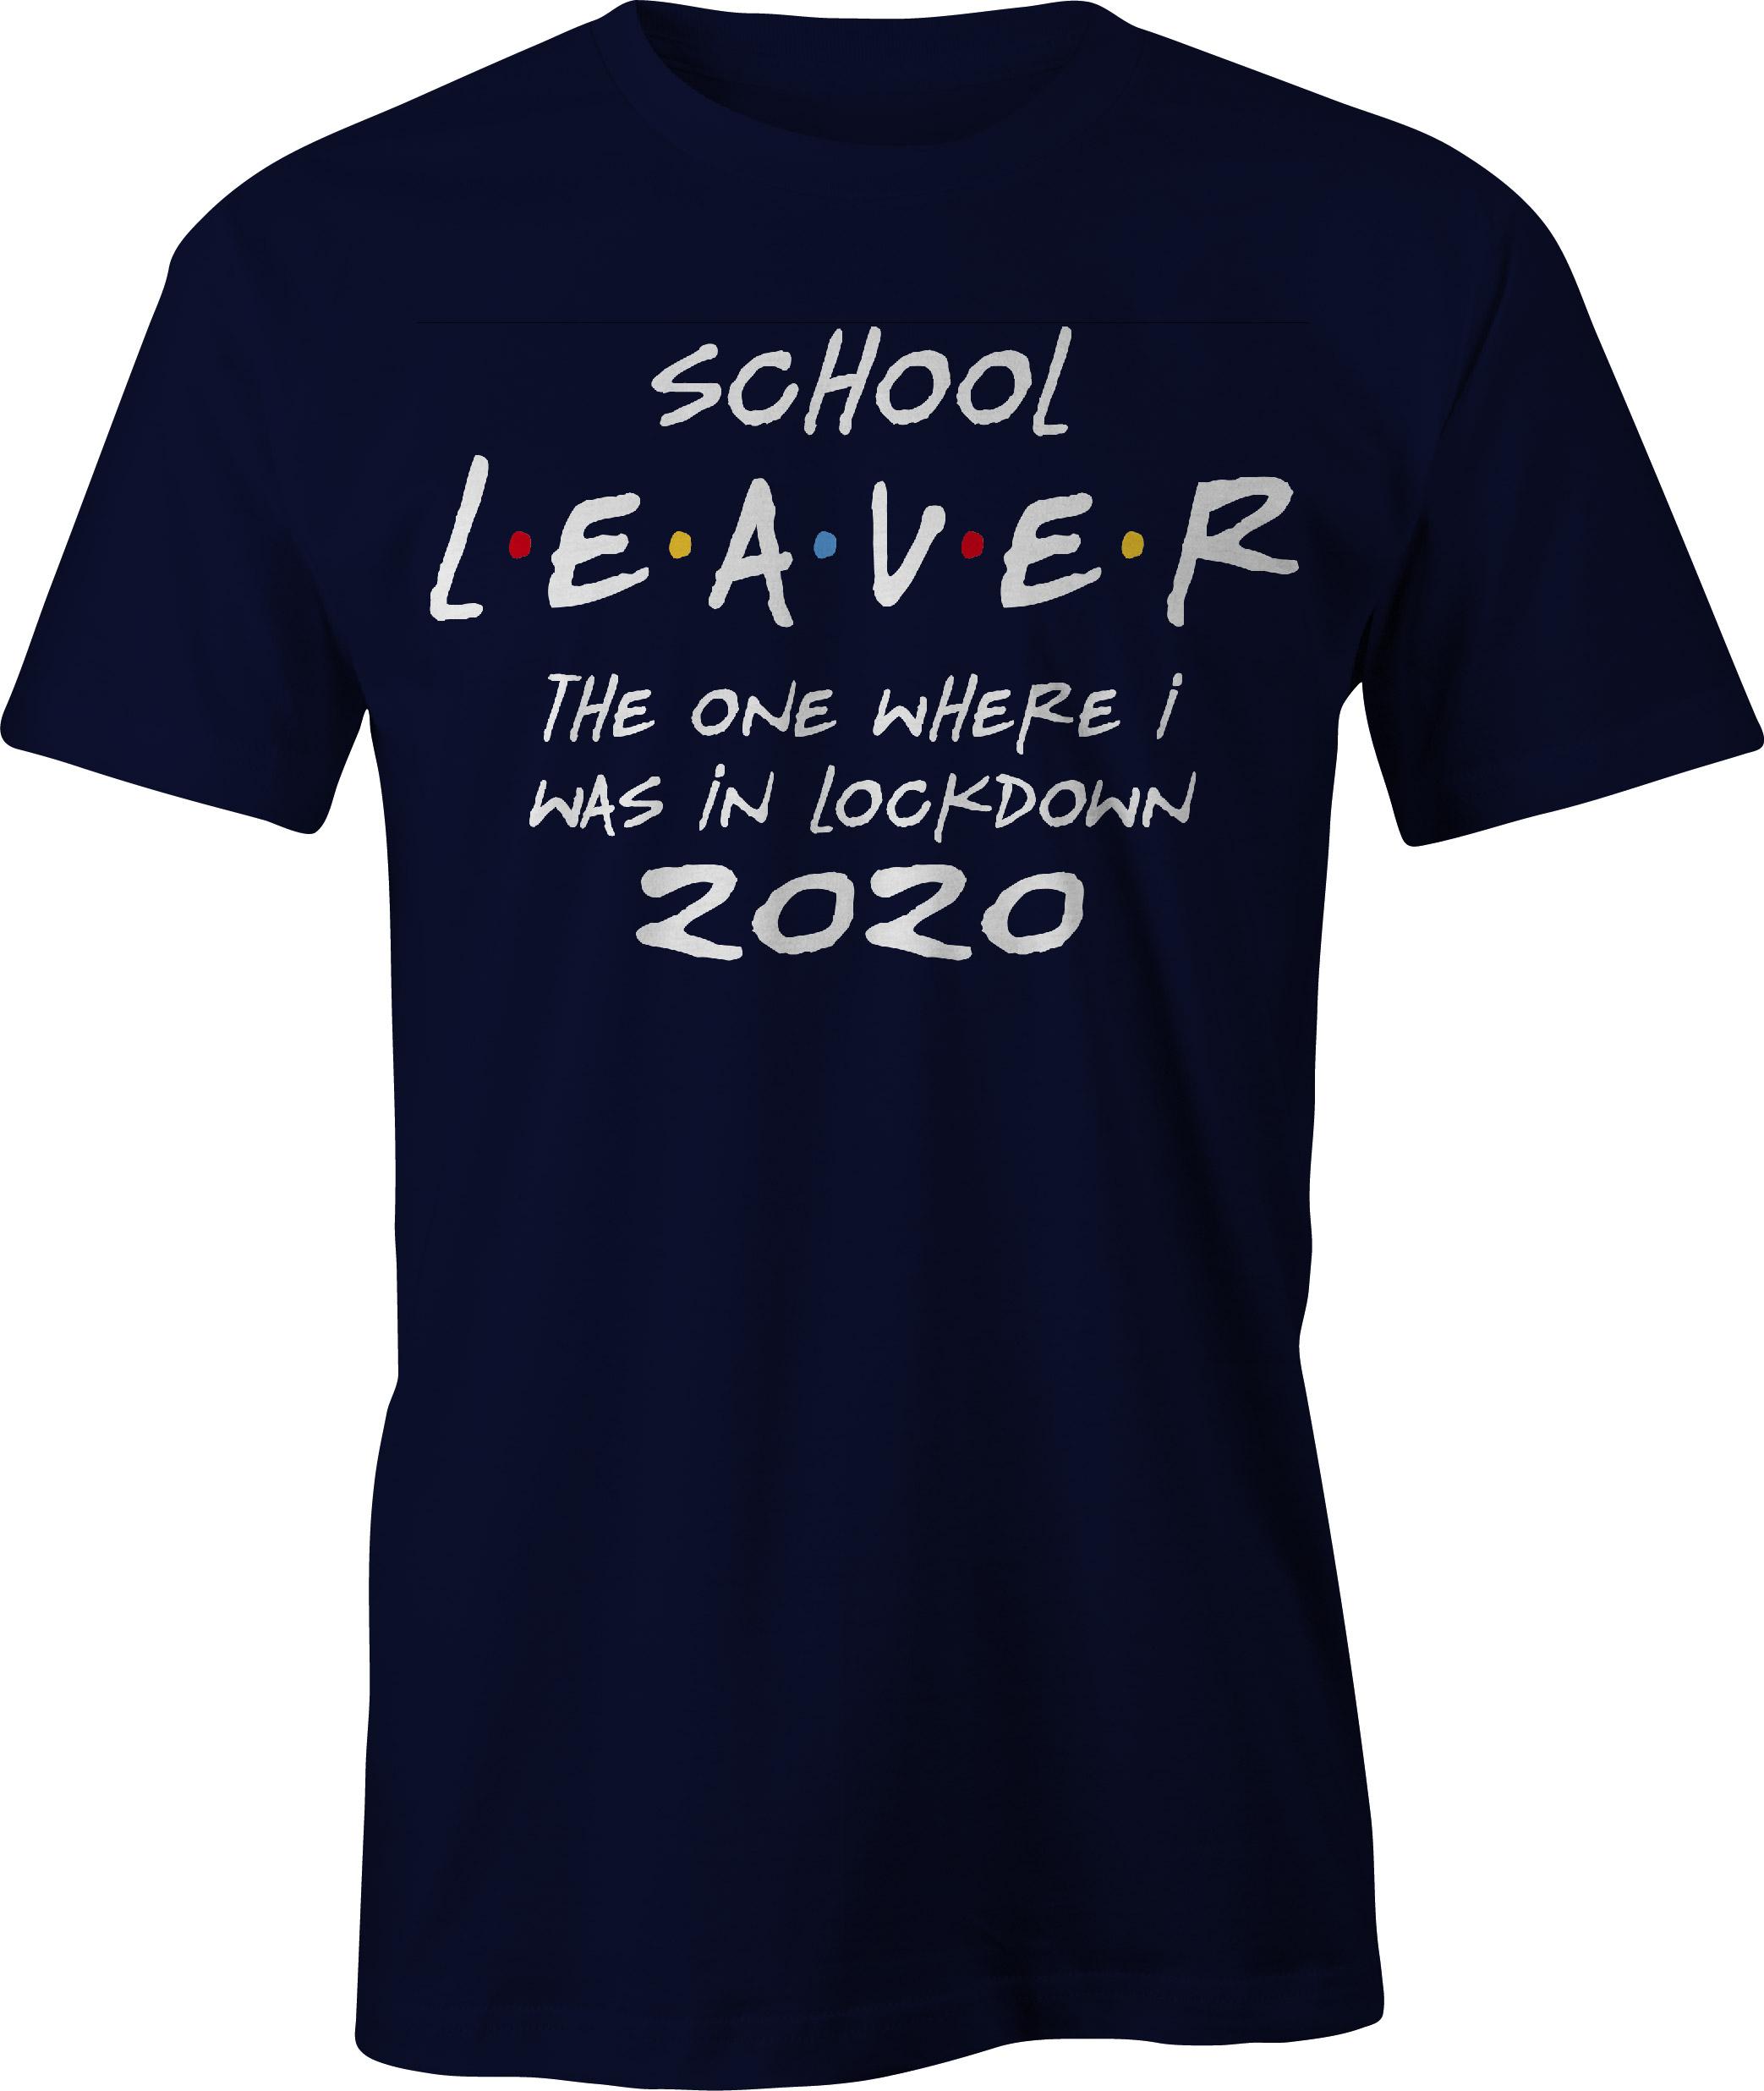 School leaver in lockdown t-shirt - navy